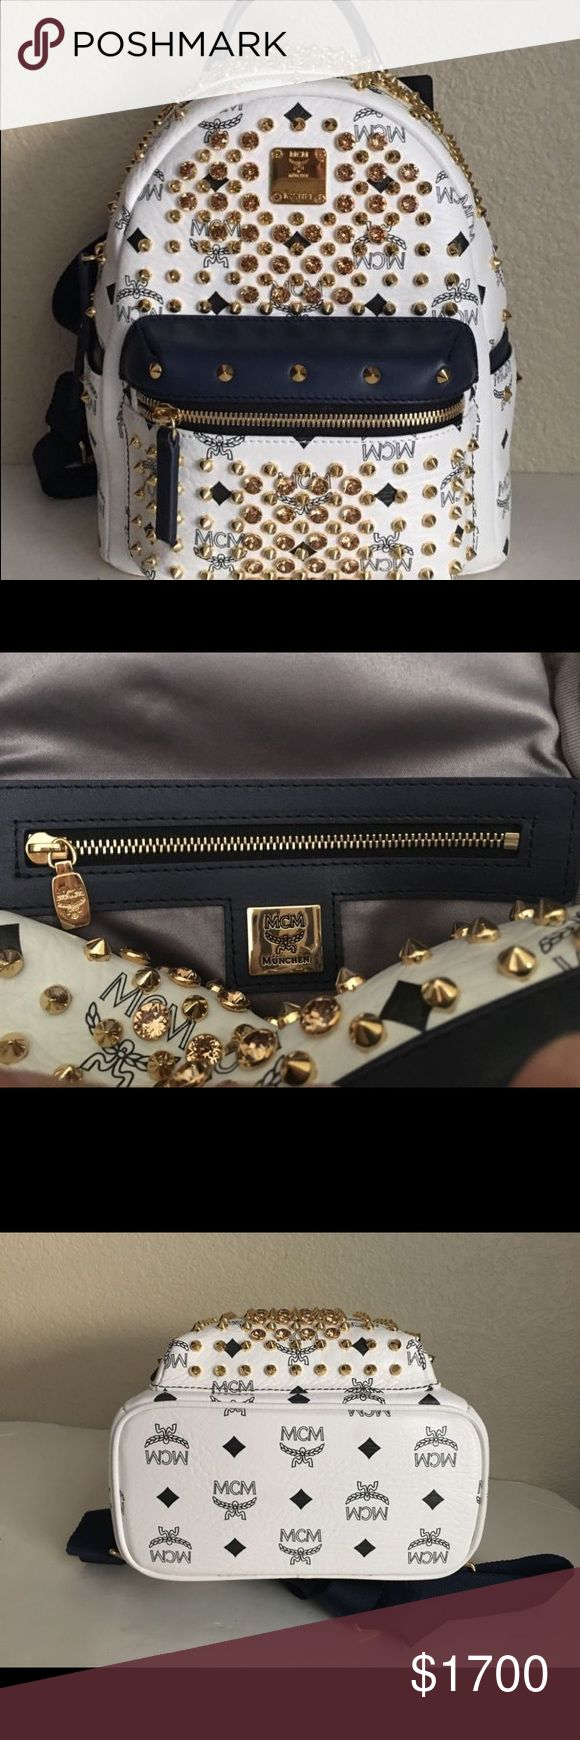 MCM Special Mini Stark Swarovski Studded Backpack Brand New 100% Authentic MCM Special Mini Stark Swarovski Studded Backpack MCM Bags Backpacks